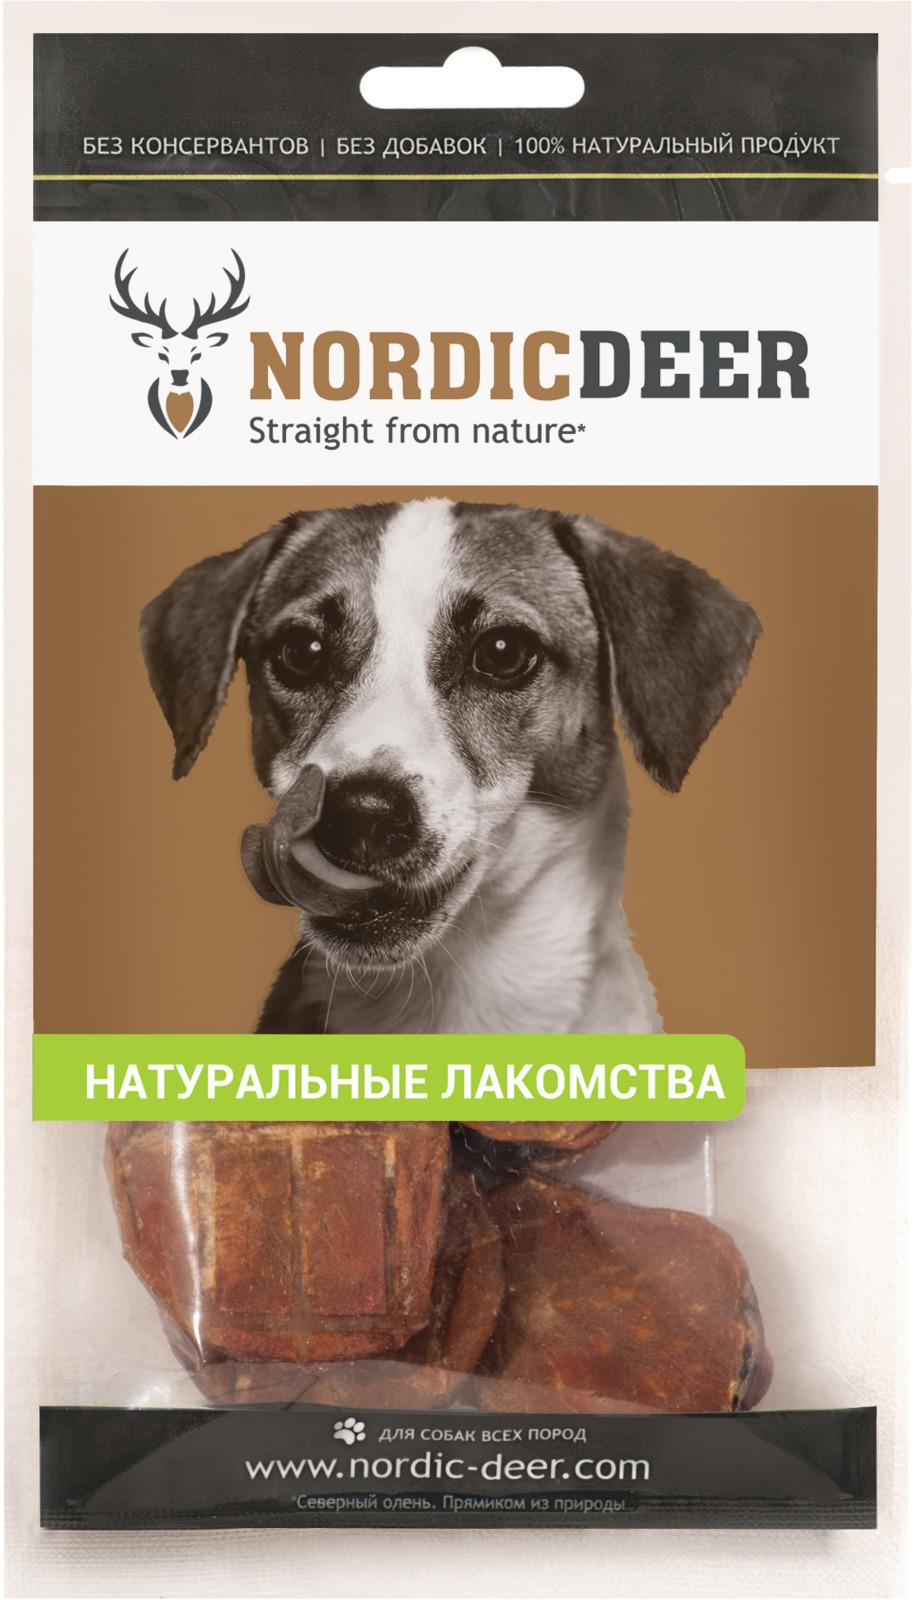 Лакомство для собак Nordic Deer Семенники говяжьи, 40 г nordic modern living room bedroom background simple english deer head decorative